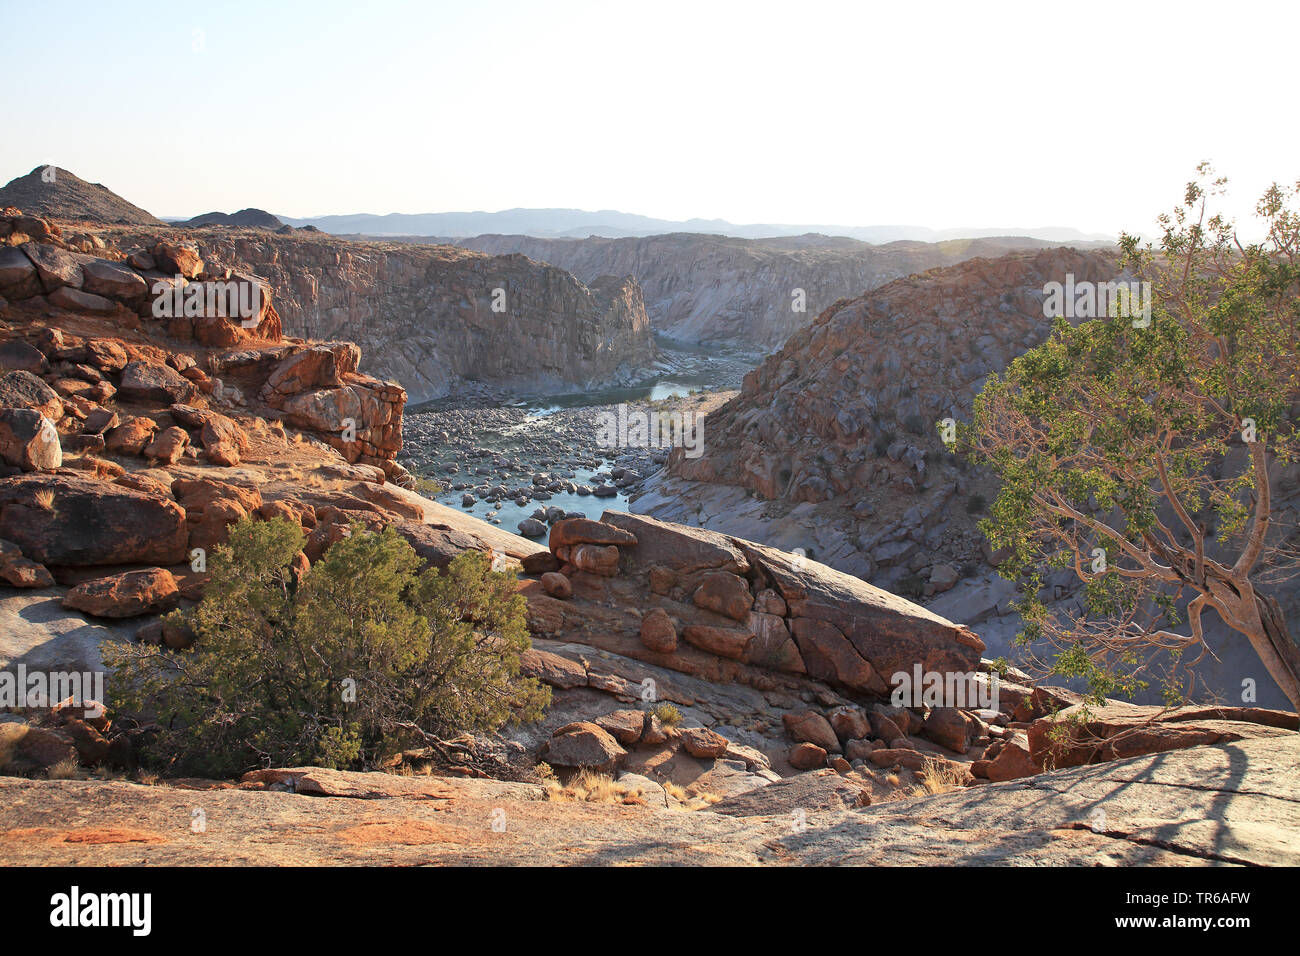 Orange River Schlucht bei Ararat, Suedafrika, Augrabies Falls Nationalpark | Orange River Gorge near Ararat, South Africa, Augrabies Falls National Pa - Stock Image